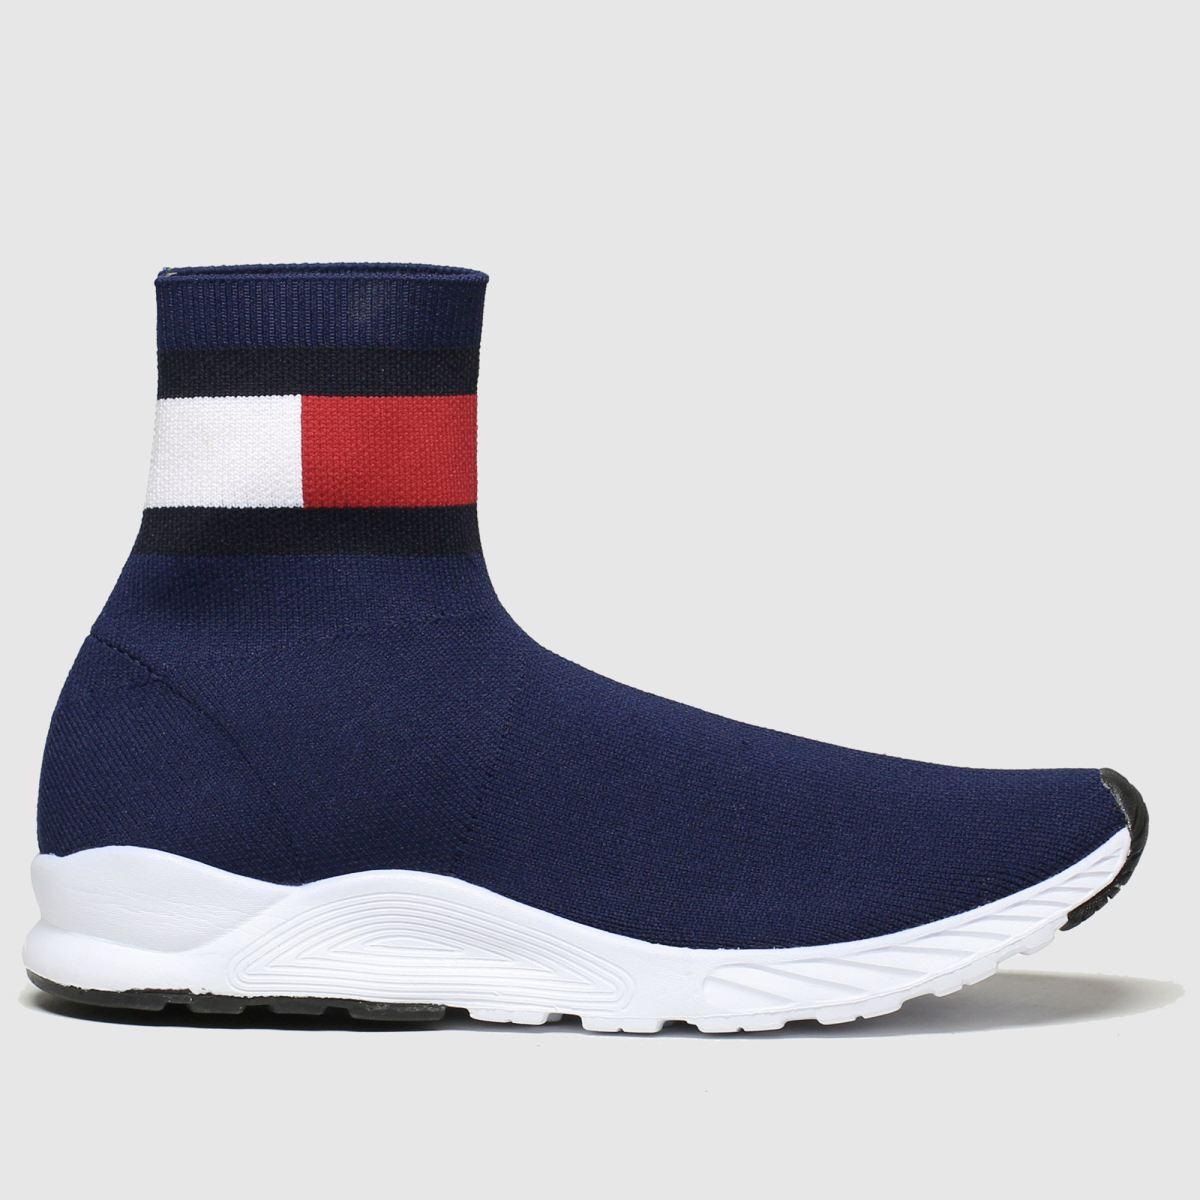 Tommy Hilfiger Navy & White Bootie Sneaker Boots Junior